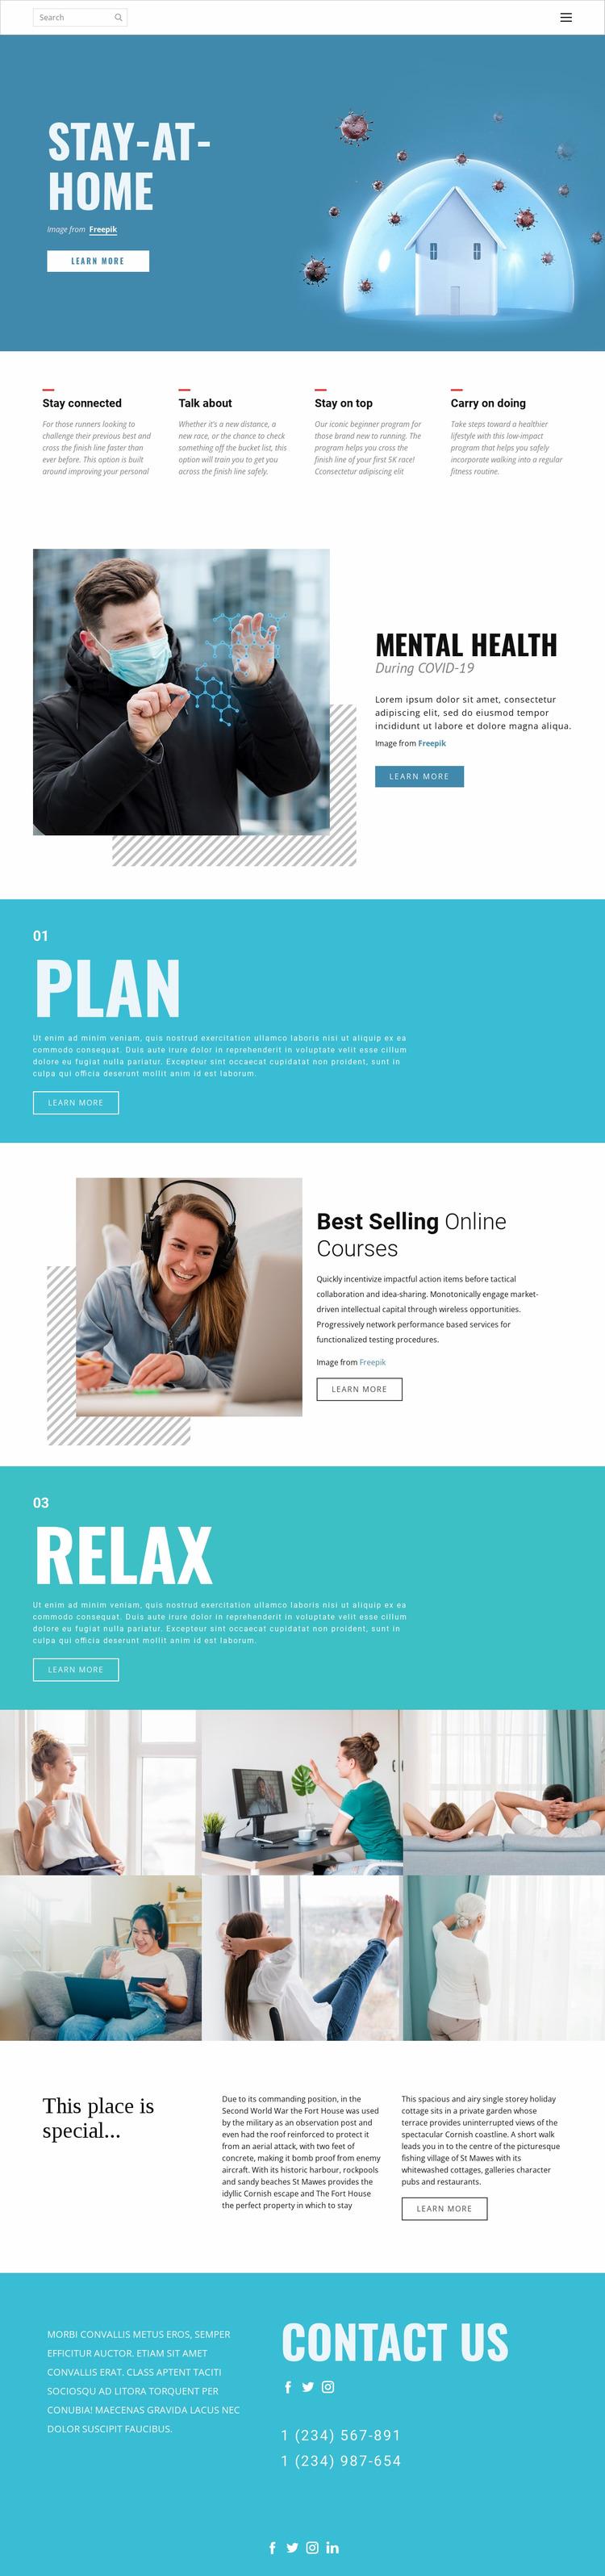 Stay-at-home medicine WordPress Website Builder